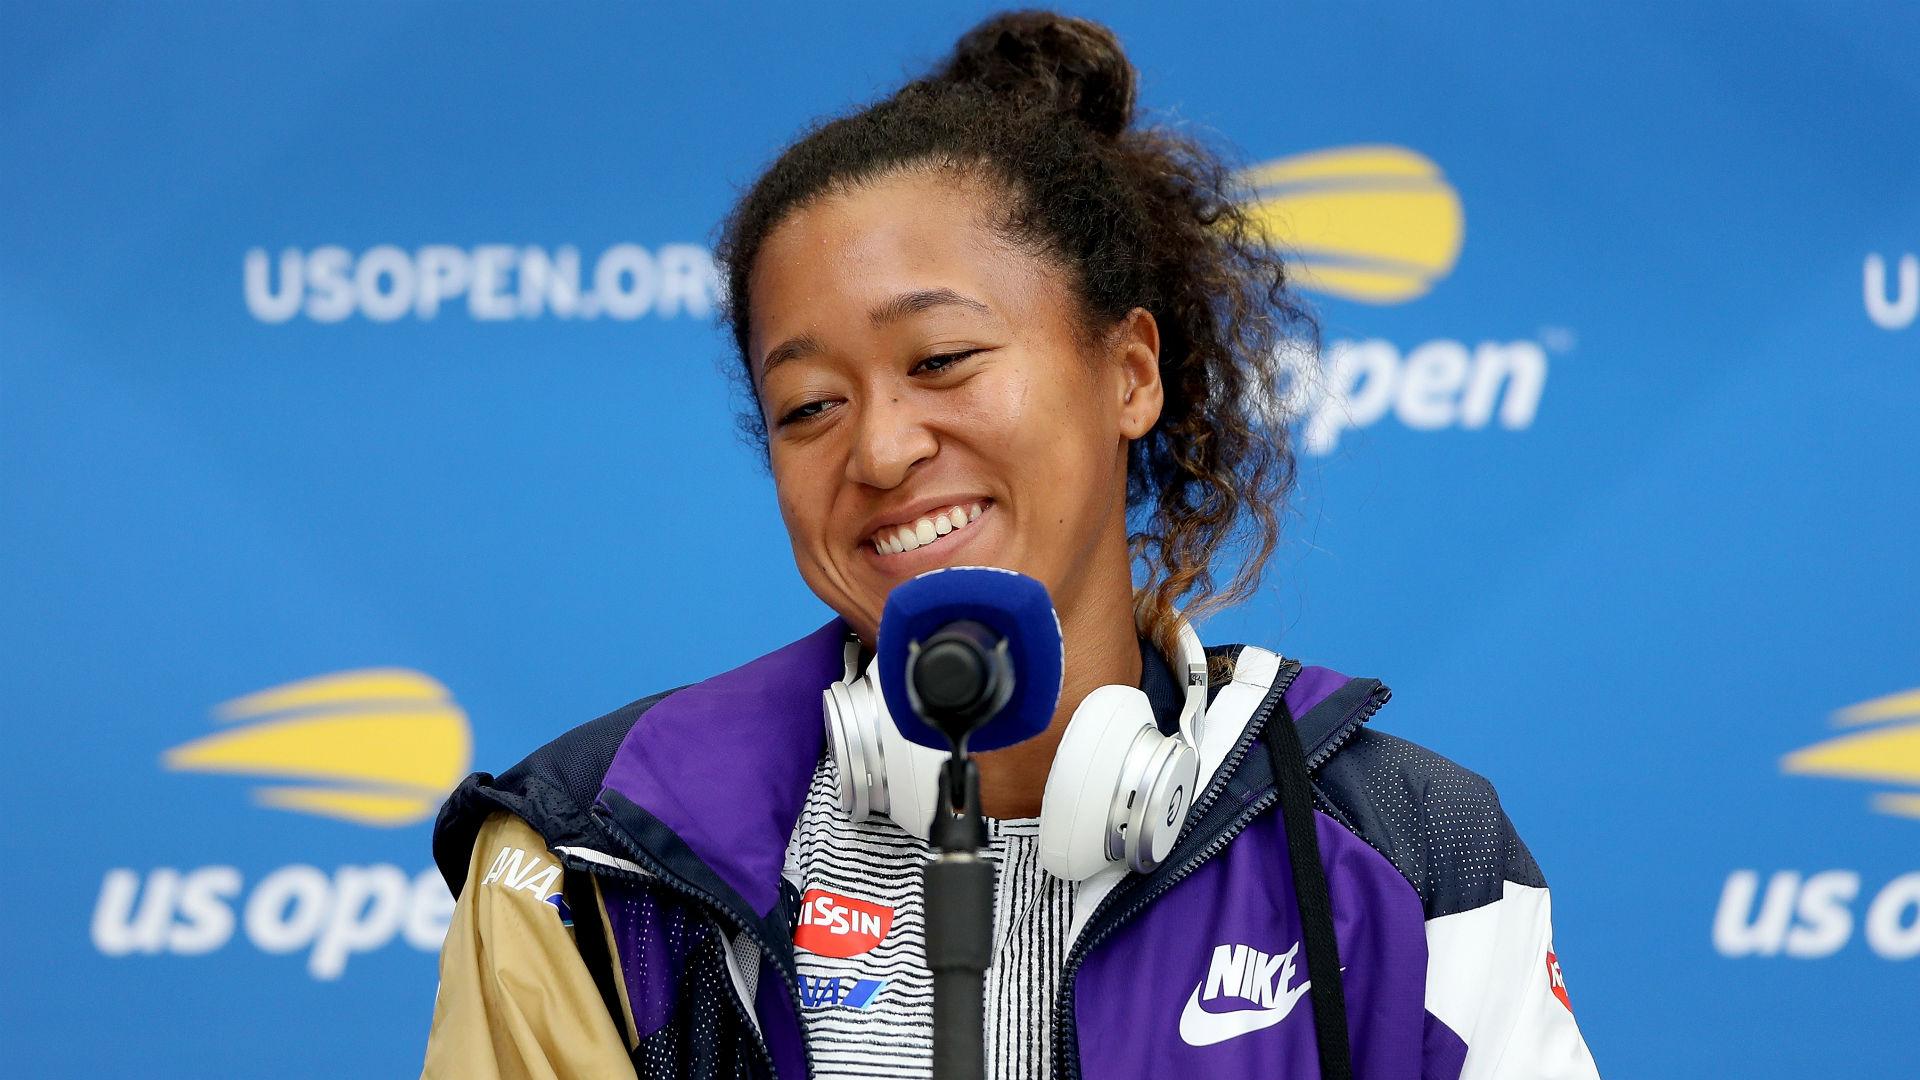 US Open 2019: Quick healer Osaka confident over fitness